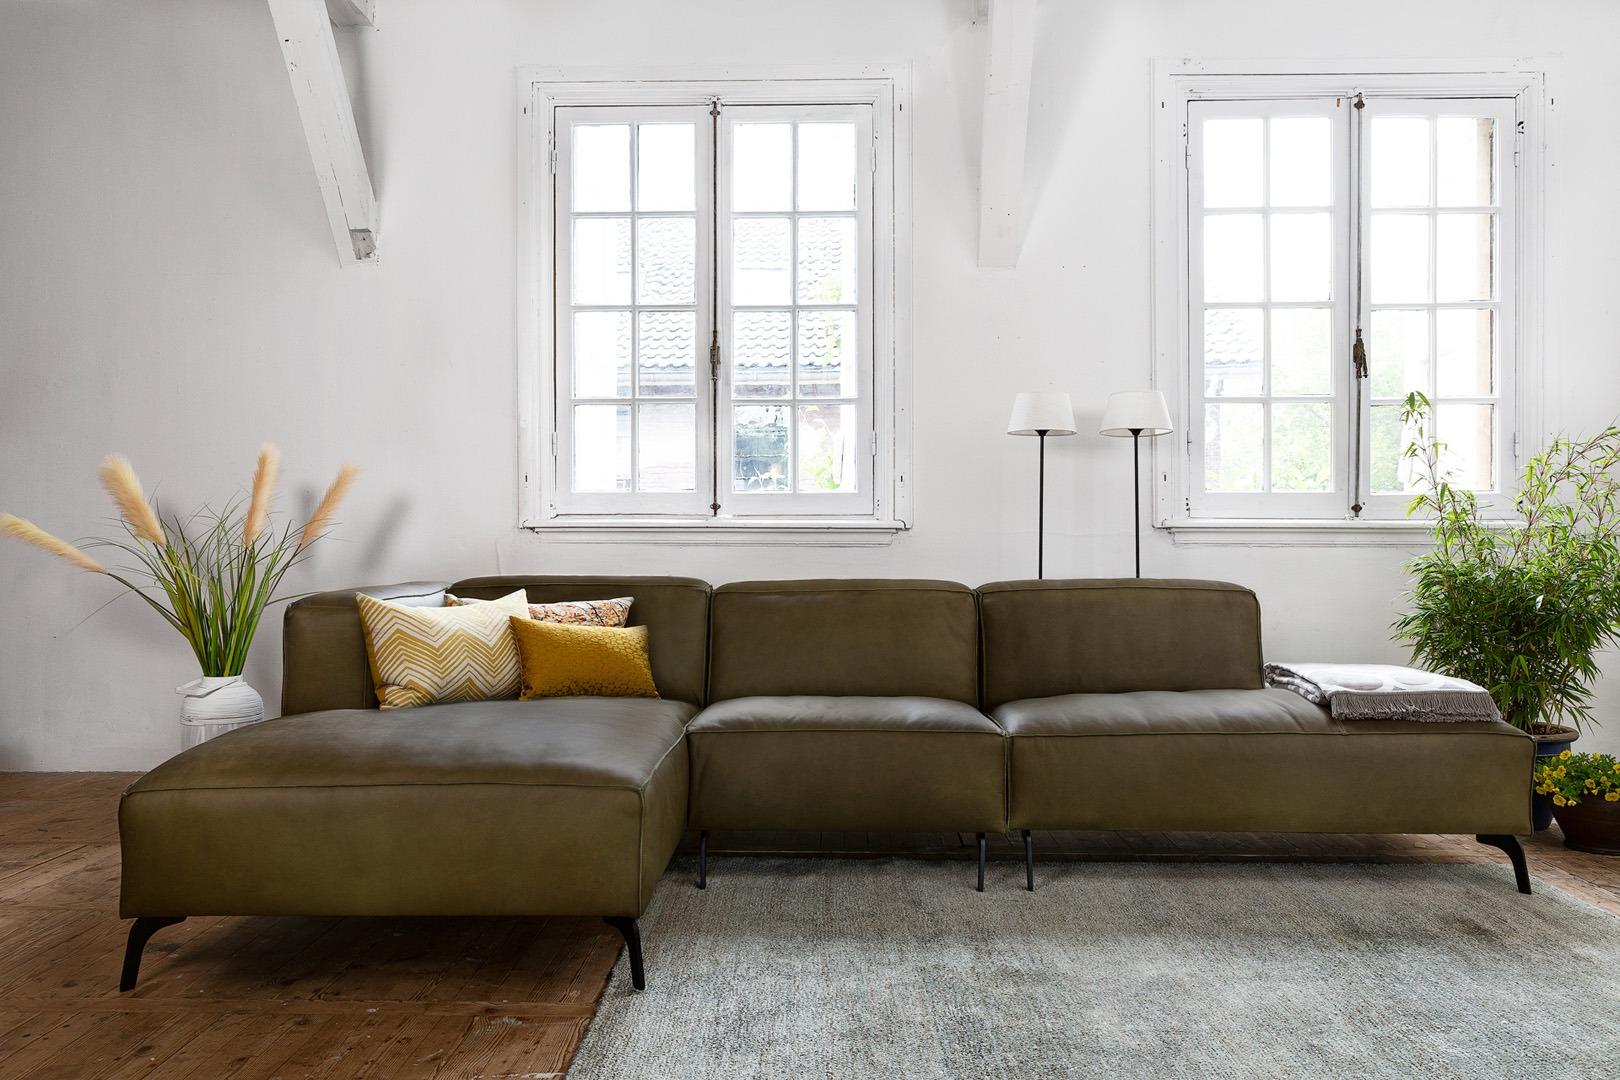 vino-piemonte-leer-groen-ottoman-terminal-longchair-soofs-interieur. (1)